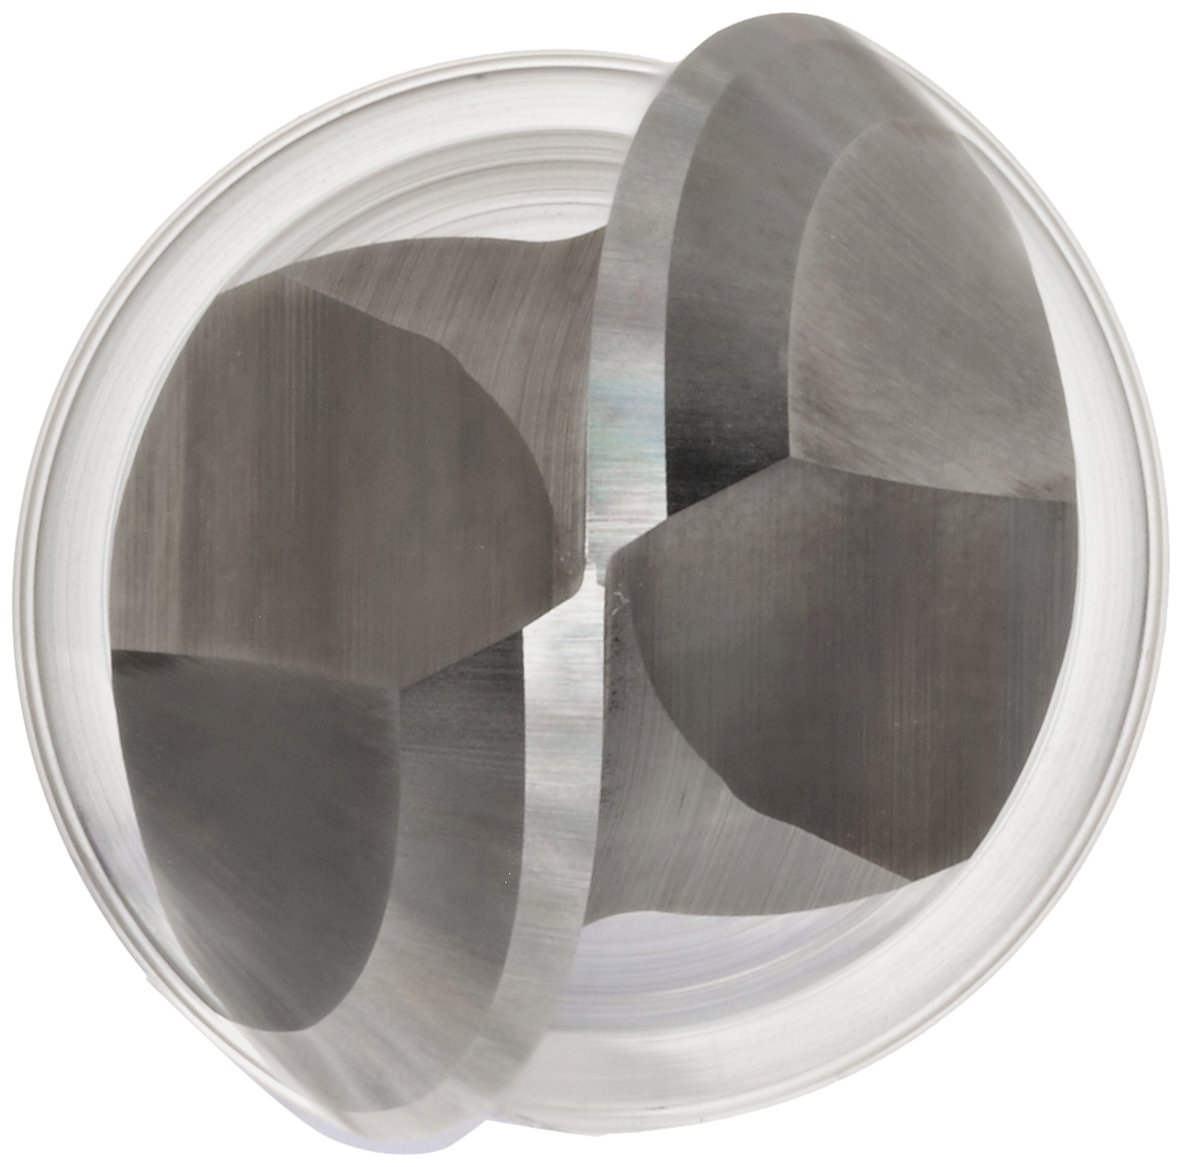 1//2 Shank x 4 Length Carbide-Tipped 1//2 Cutting Diameter x 2 Cutting Length 1//2 Shank x 4 Length 1//2 Cutting Diameter x 2 Cutting Length Southeast Tool SE1252 Op Shear Stagger Bit